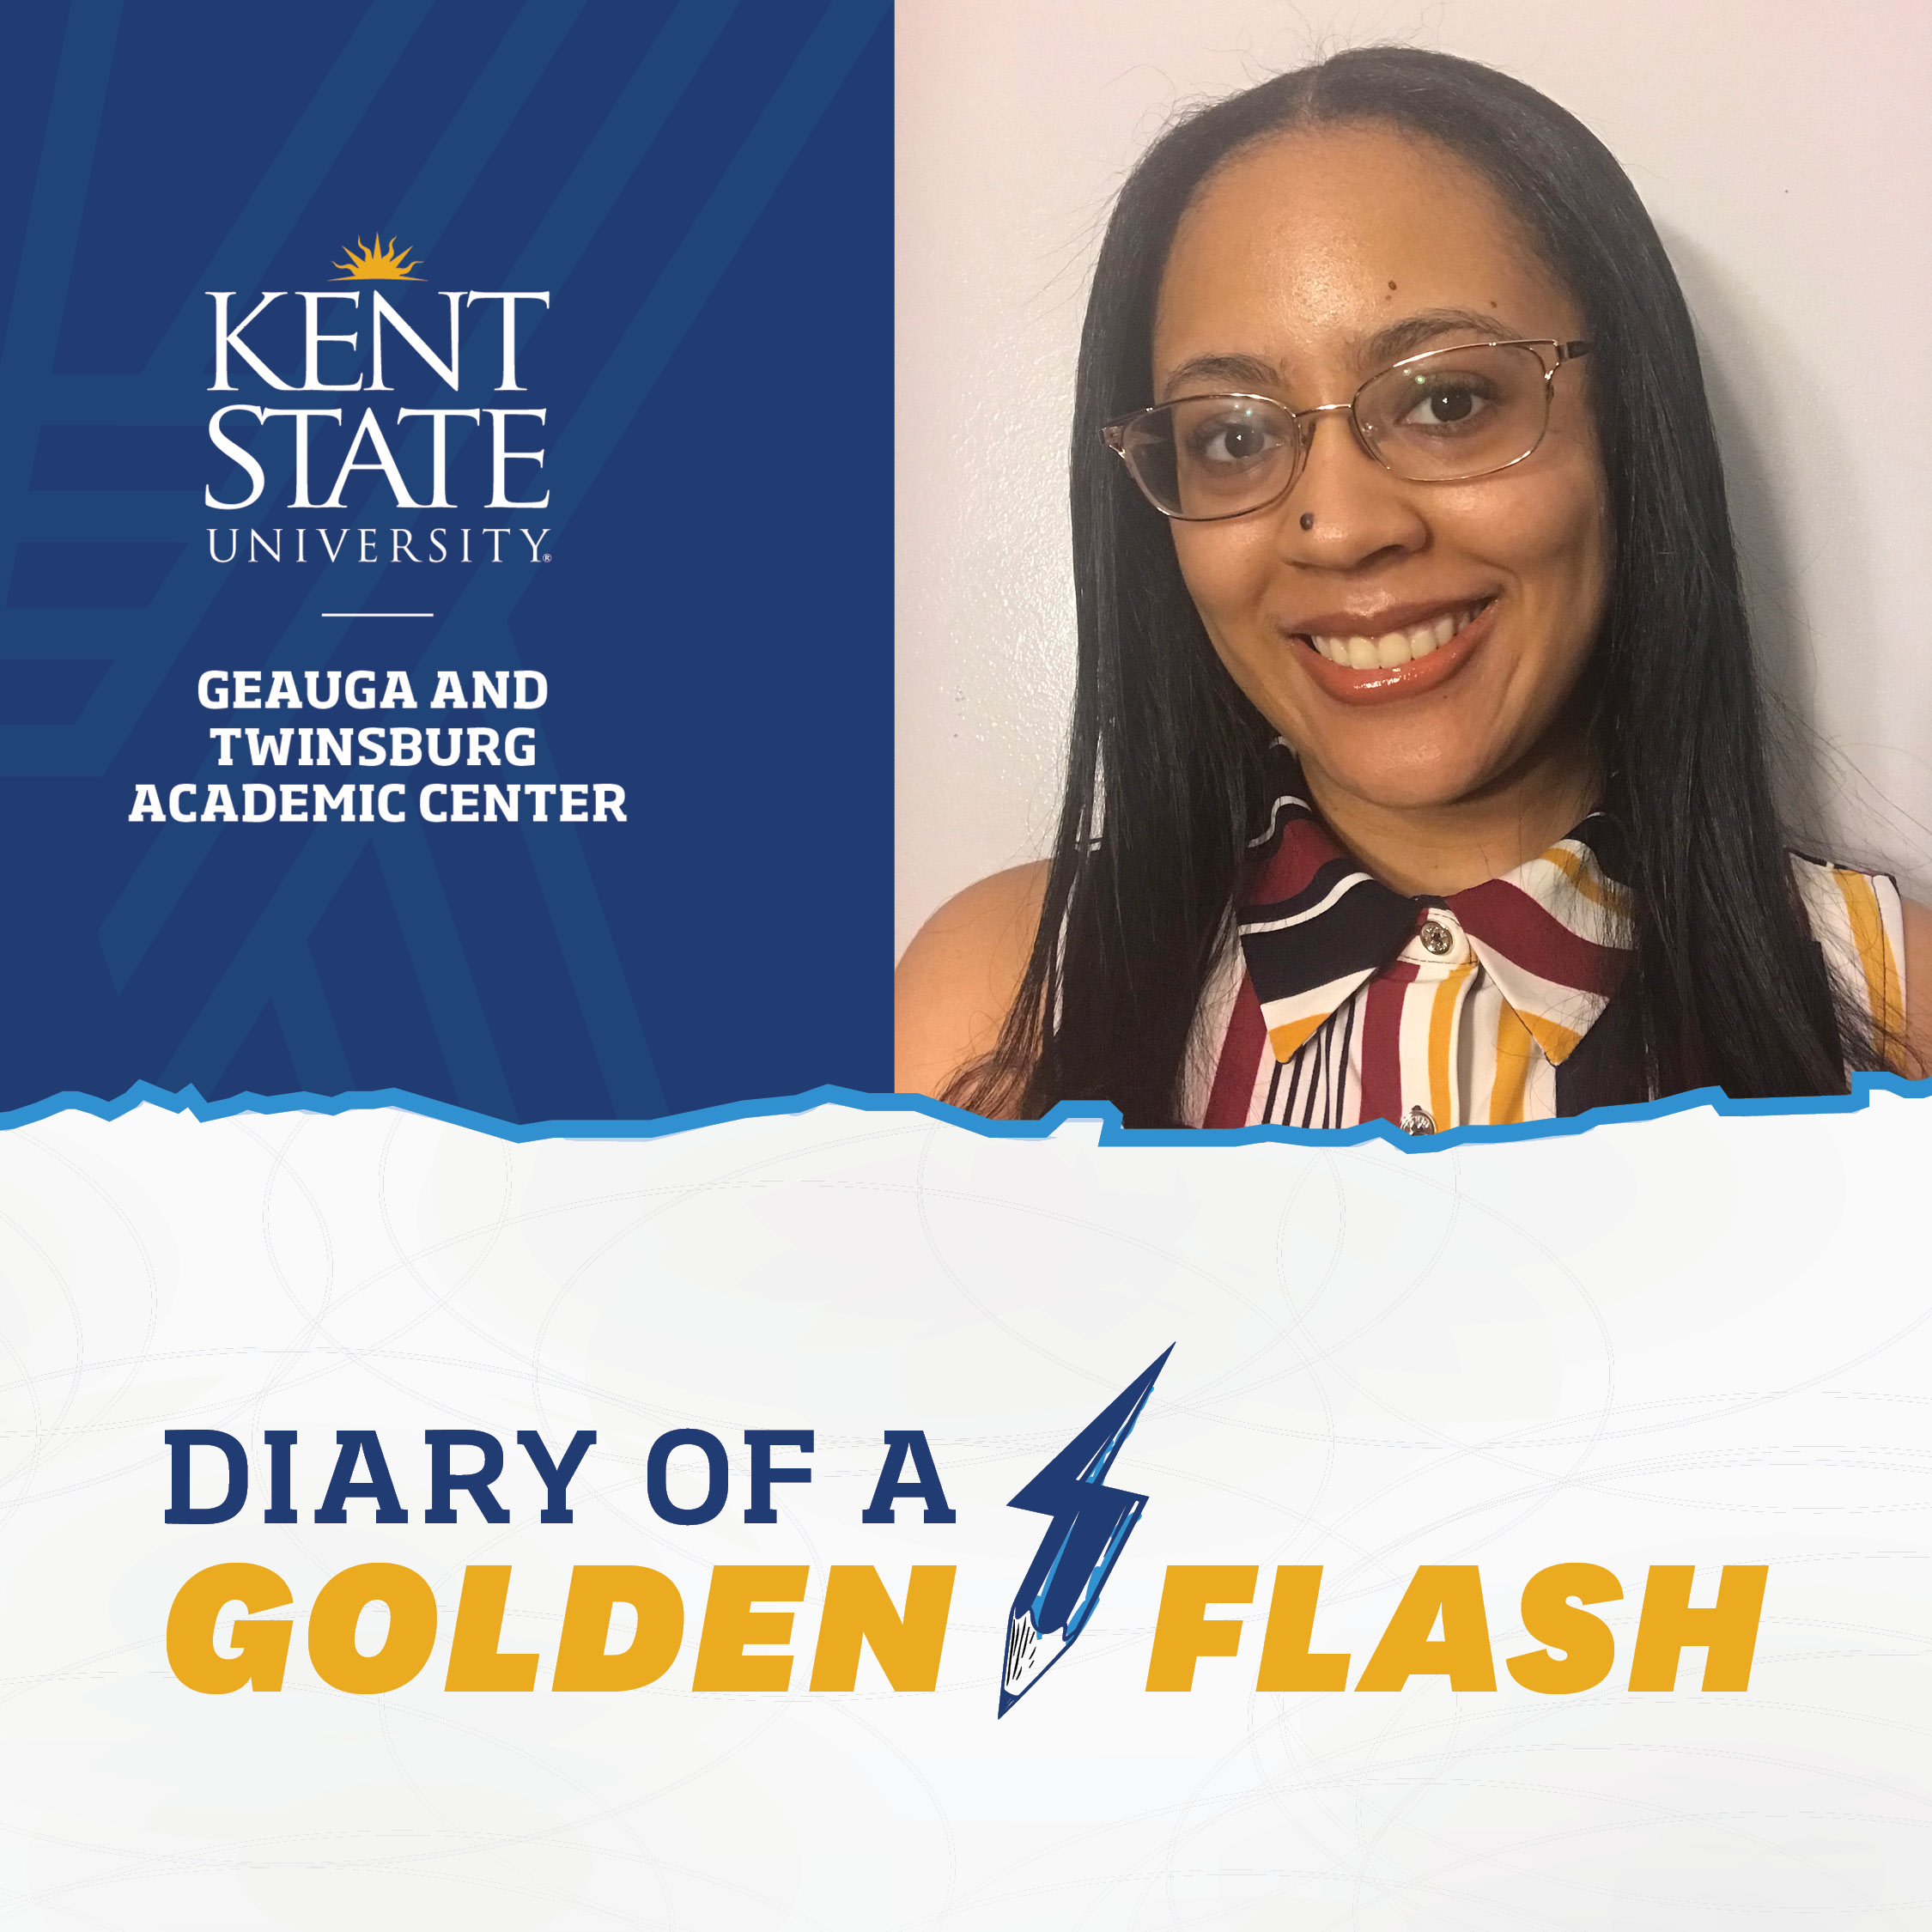 Diary of a Golden Flash - Meet Makiyah Harris